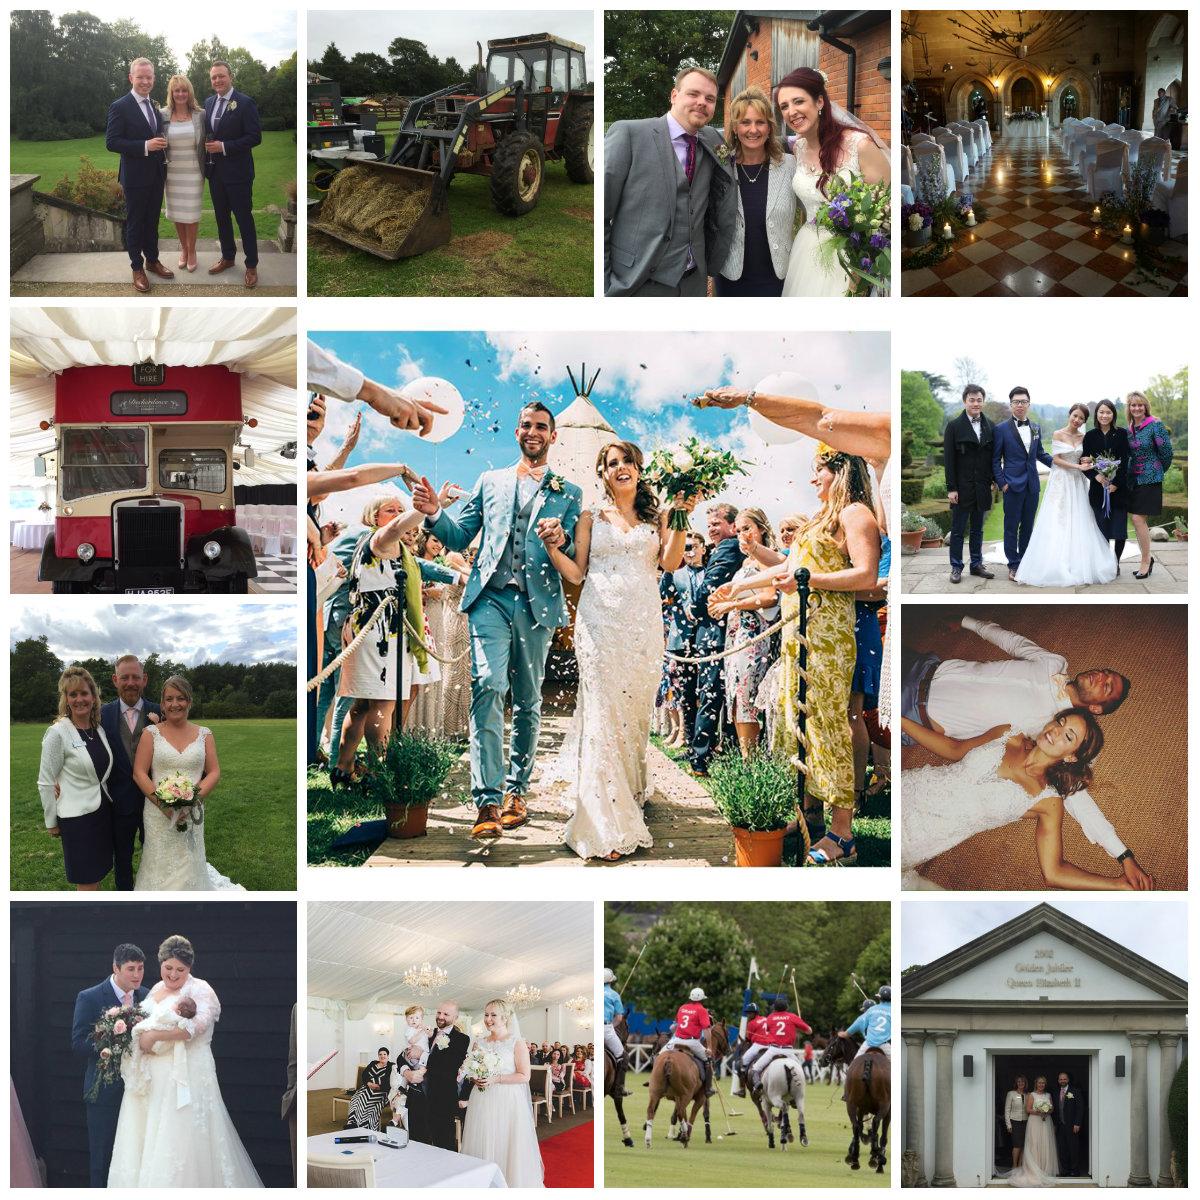 2017 wedding just celebrations celebrant